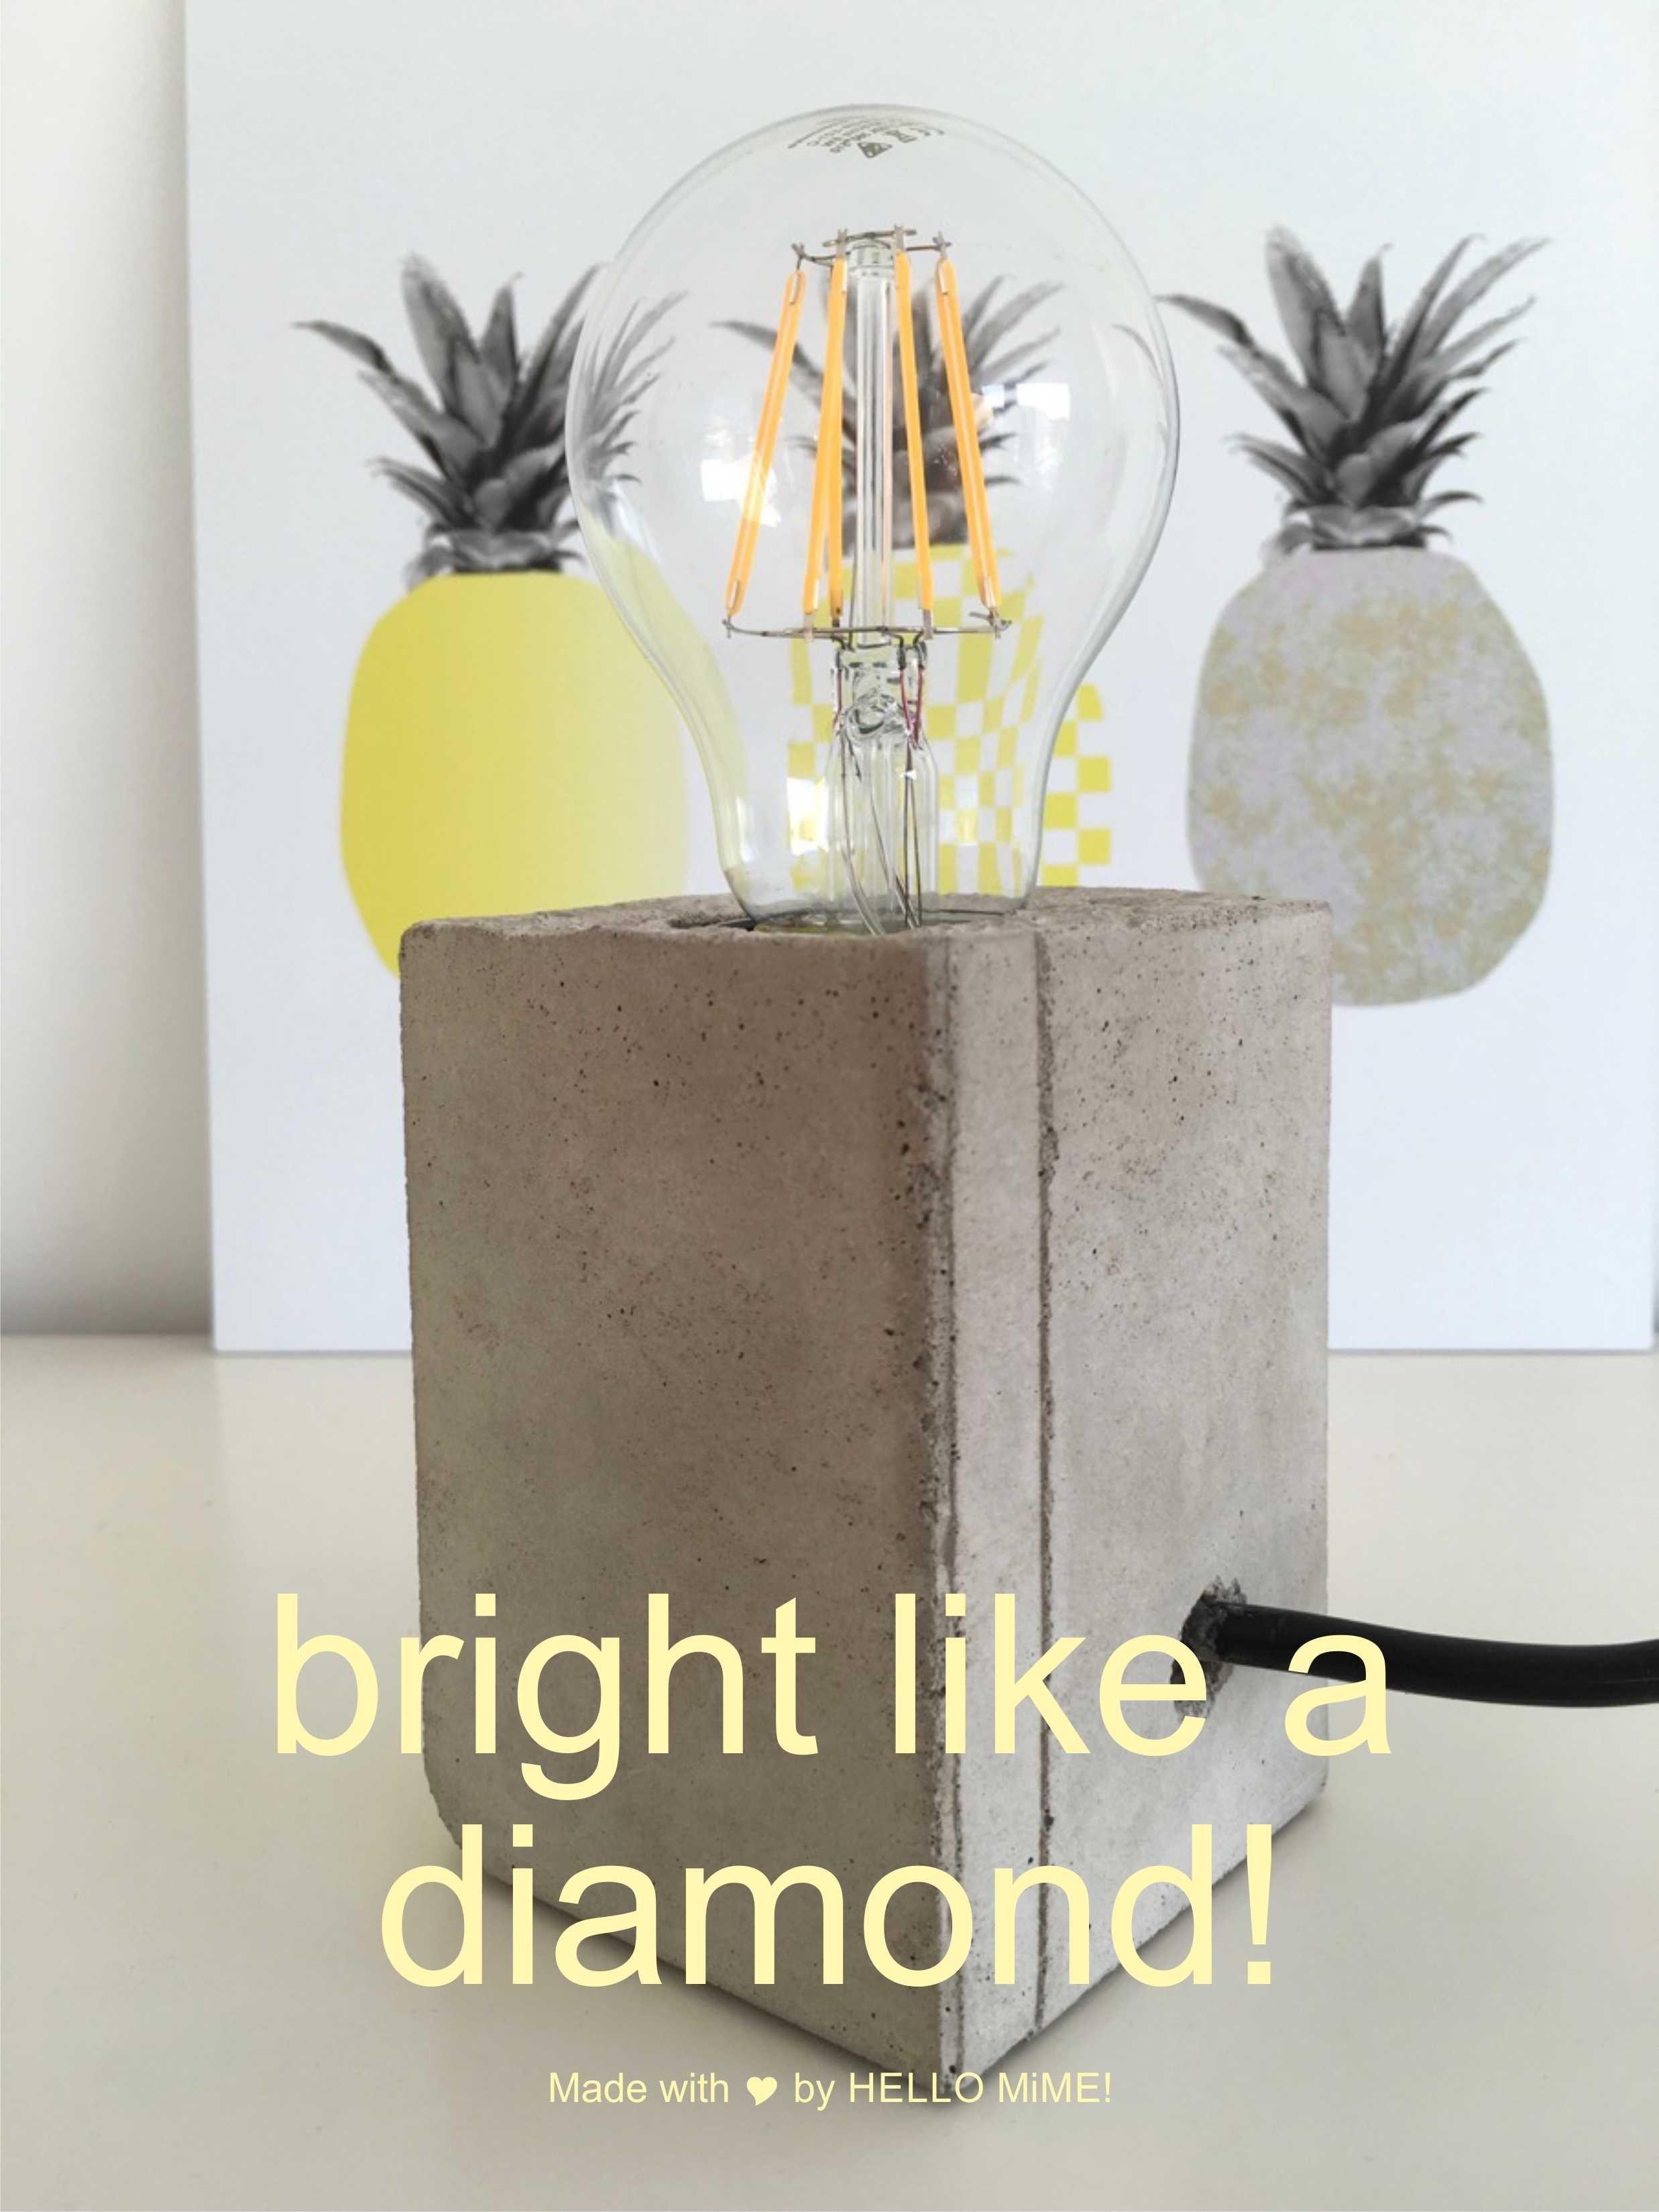 lampe mit sockel aus beton selbermachen beton pinterest lampen sockel und basteln. Black Bedroom Furniture Sets. Home Design Ideas